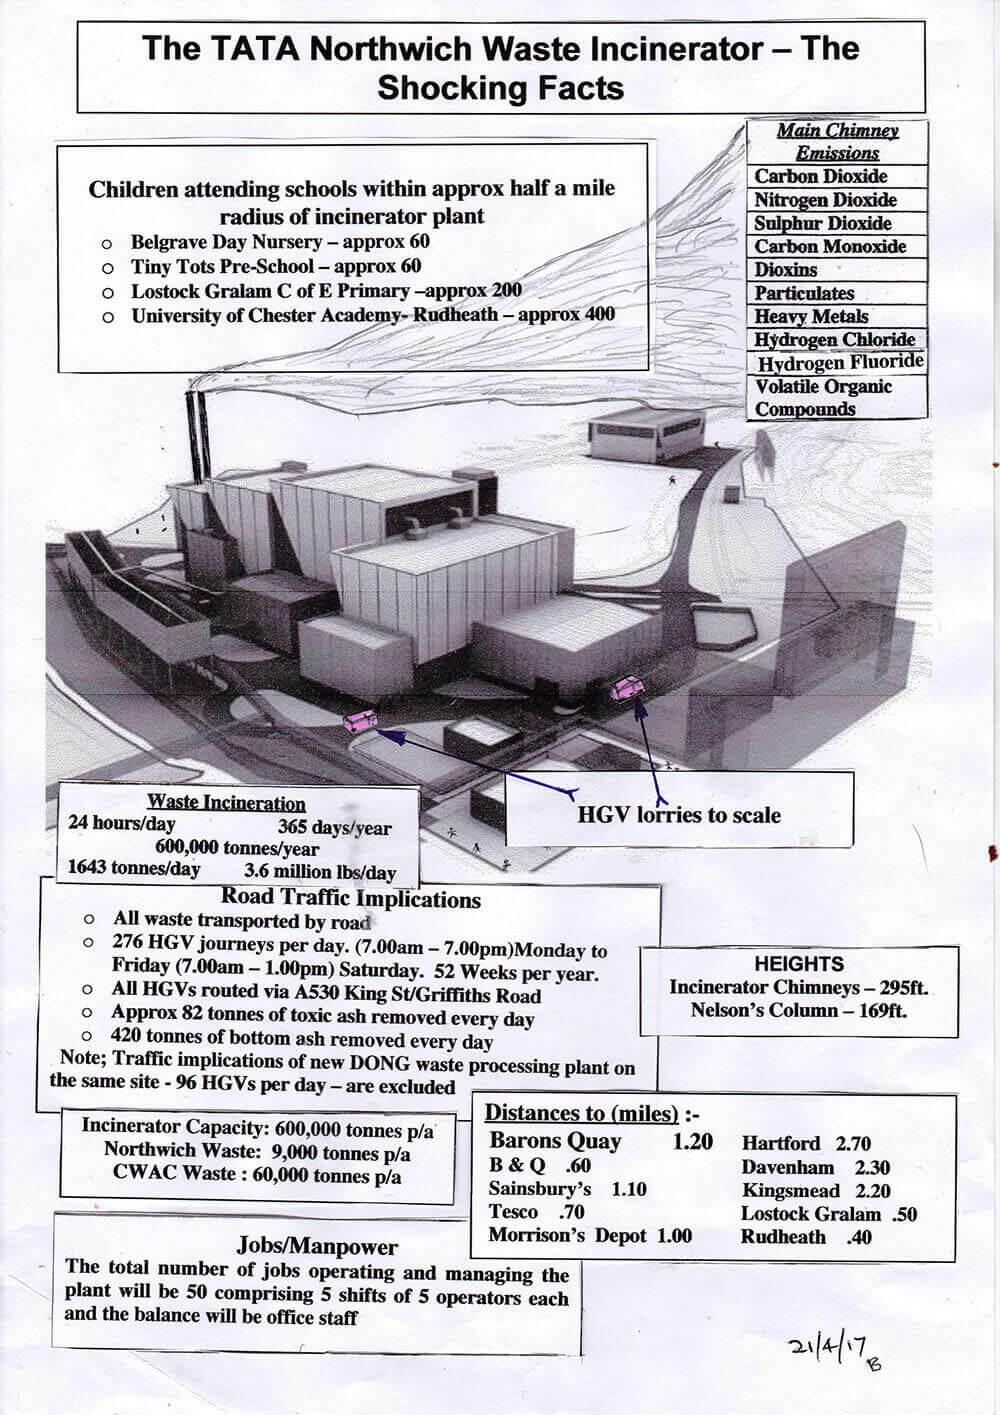 TATA Incinerator Northwich Infographic